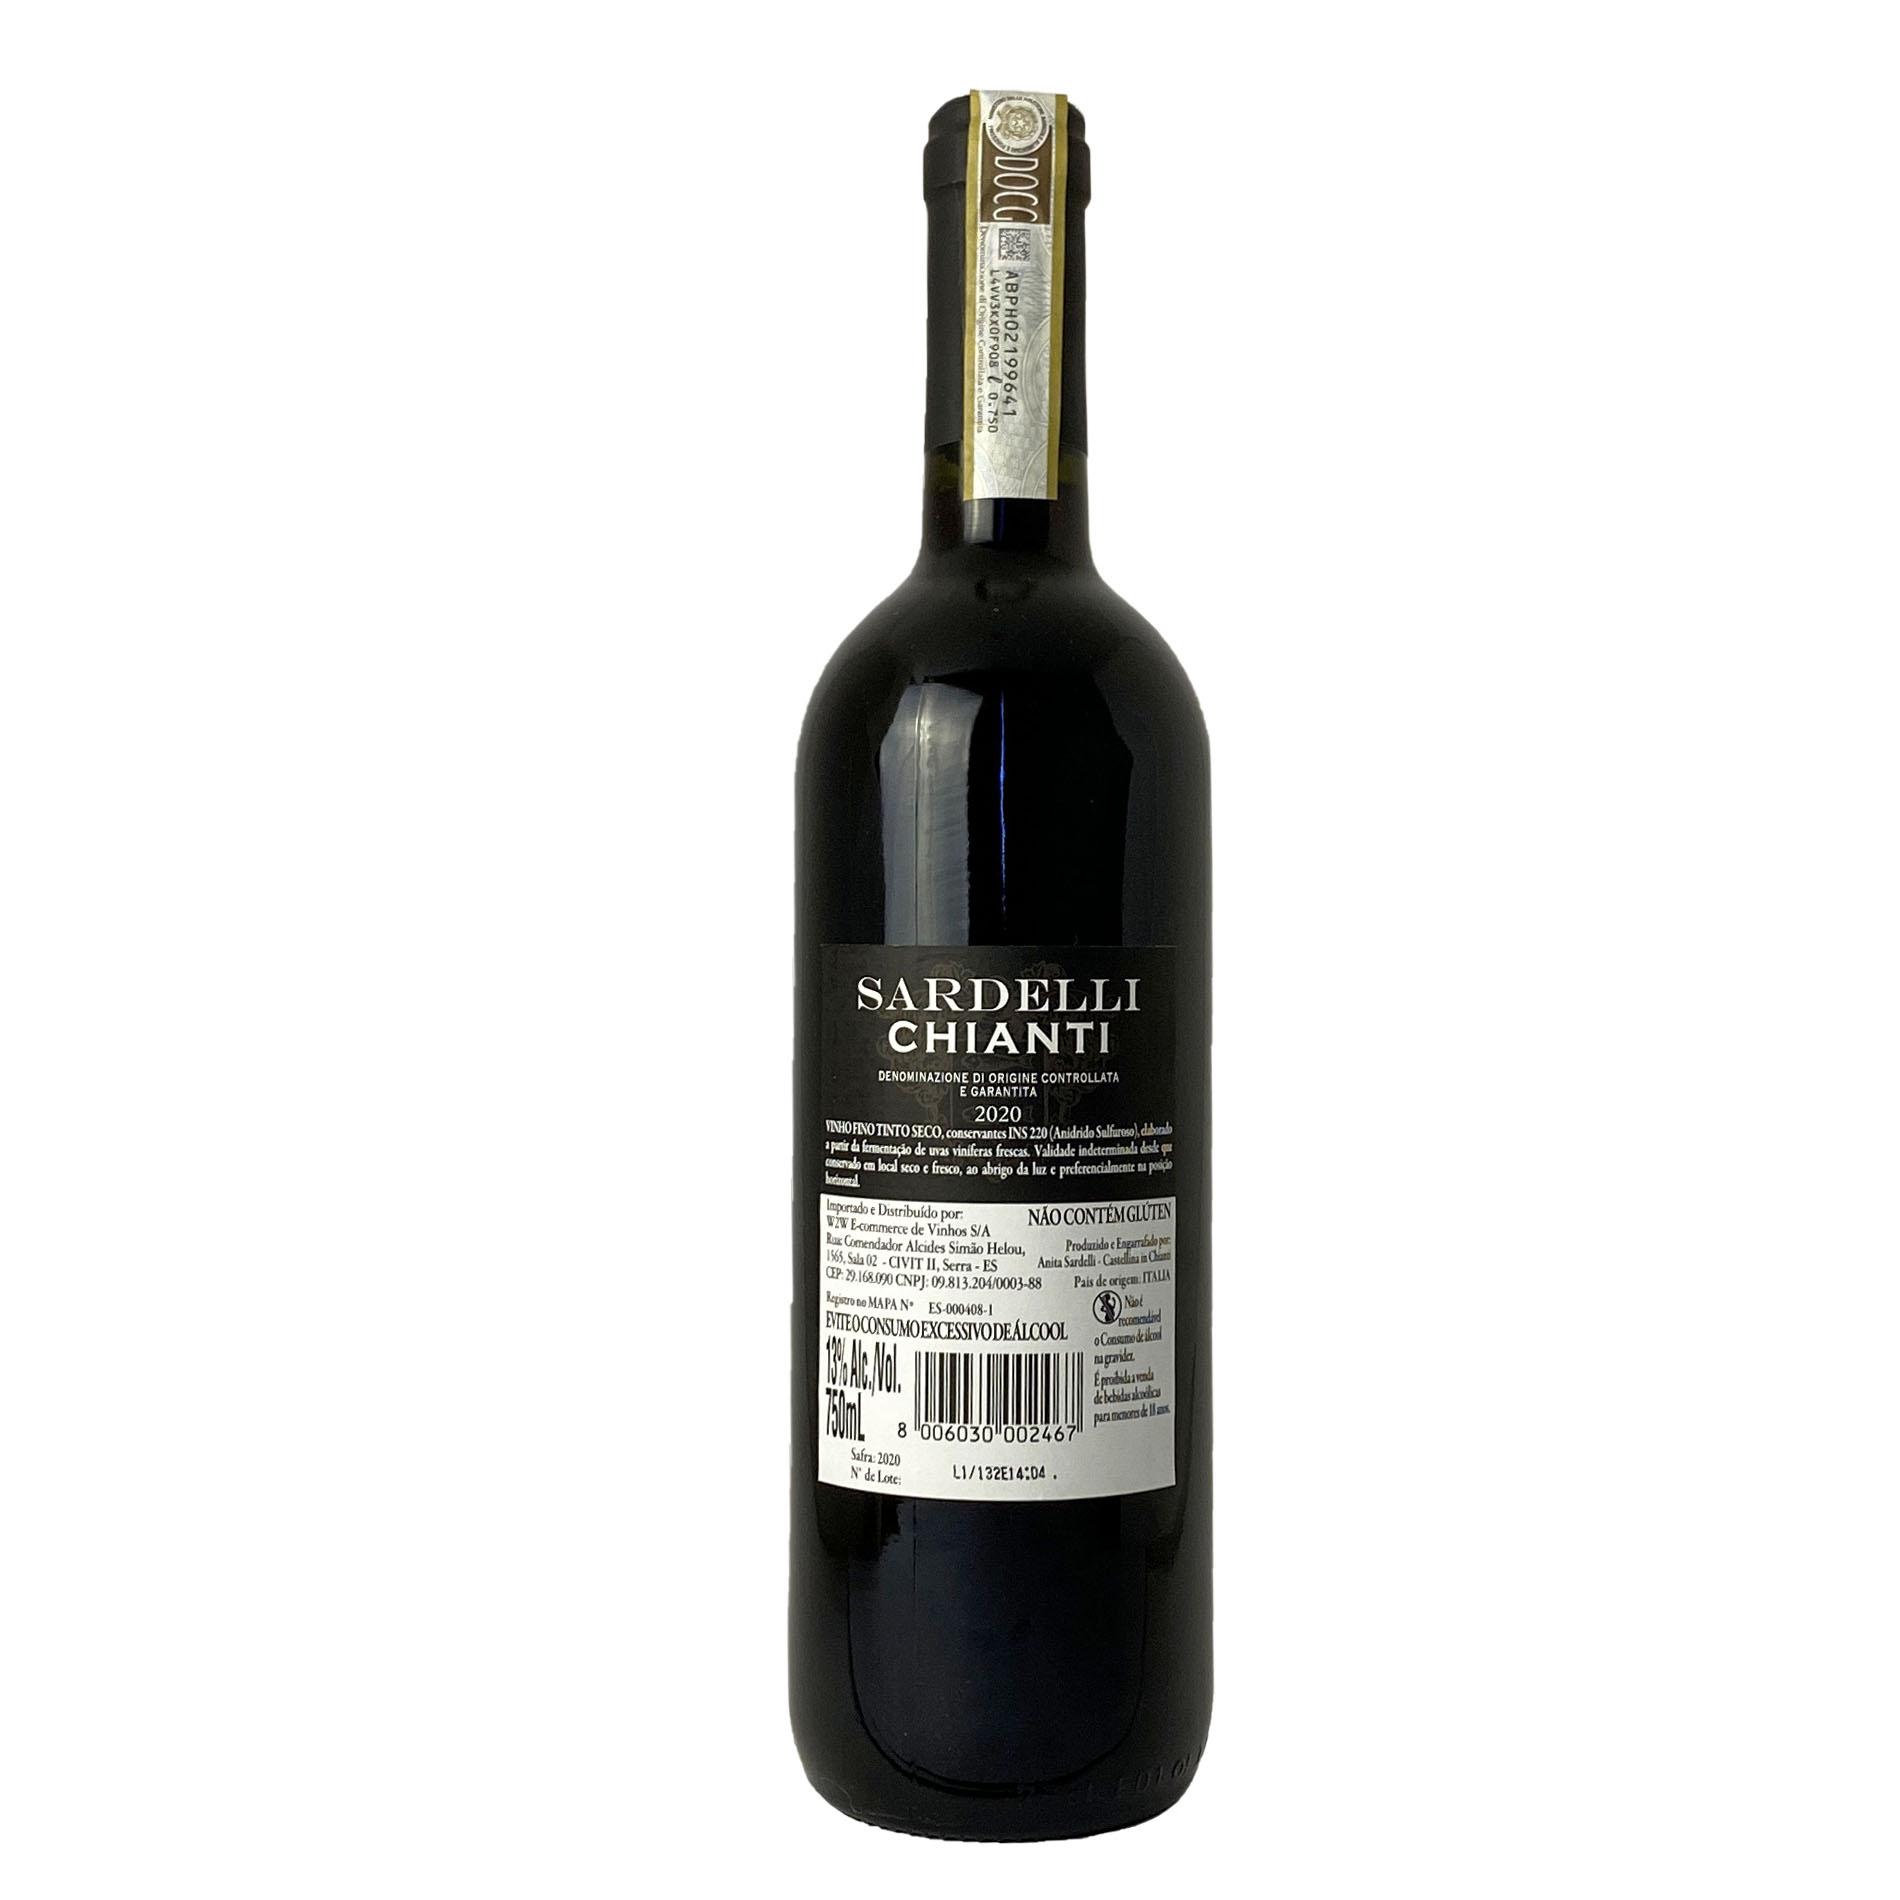 Sardelli D.O.C.G. Chianti  - Vinerize